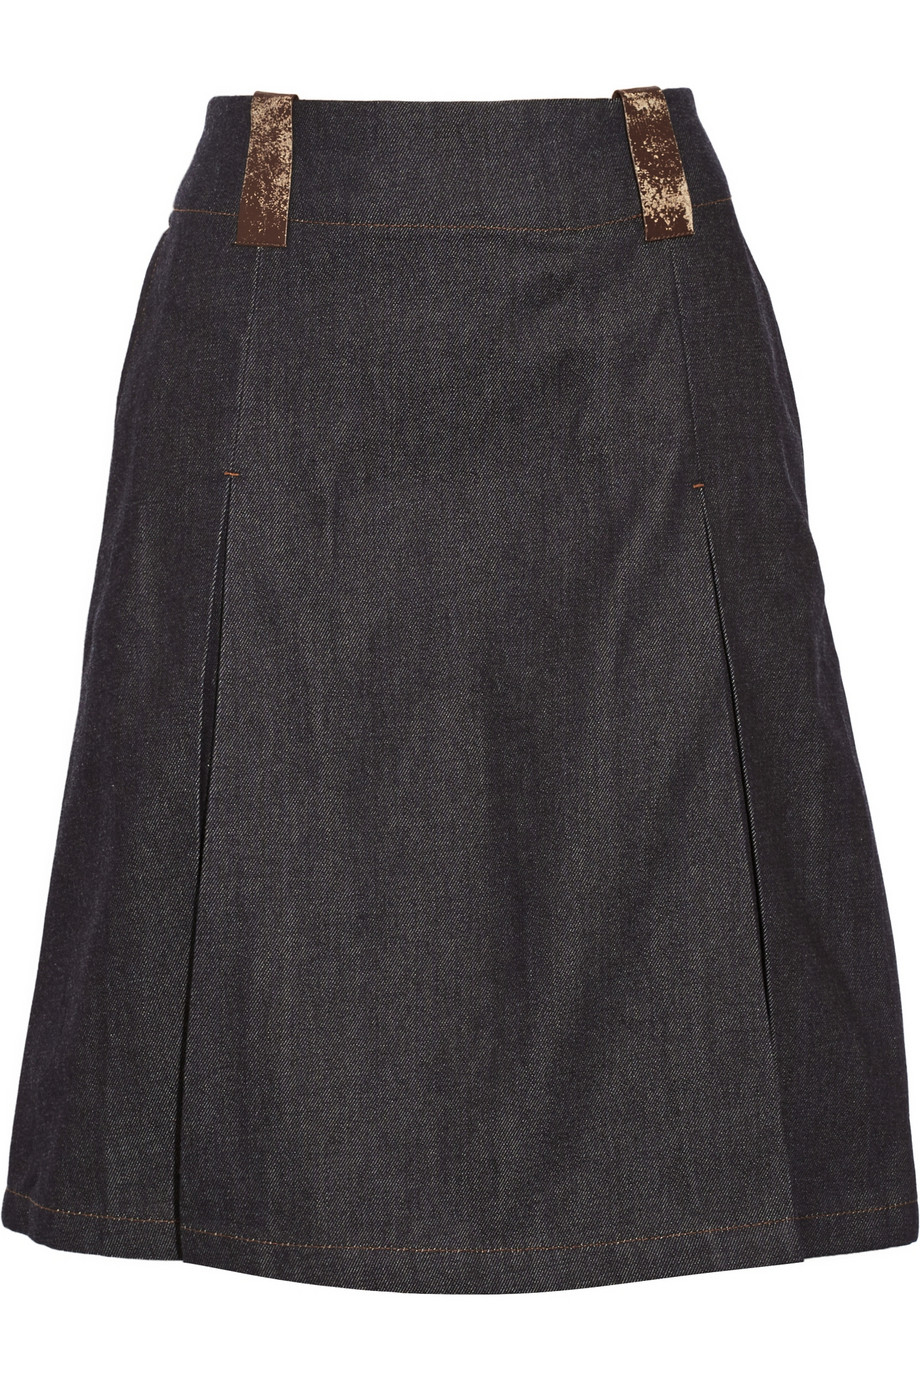 acne studios kate leather trimmed denim skirt in blue lyst